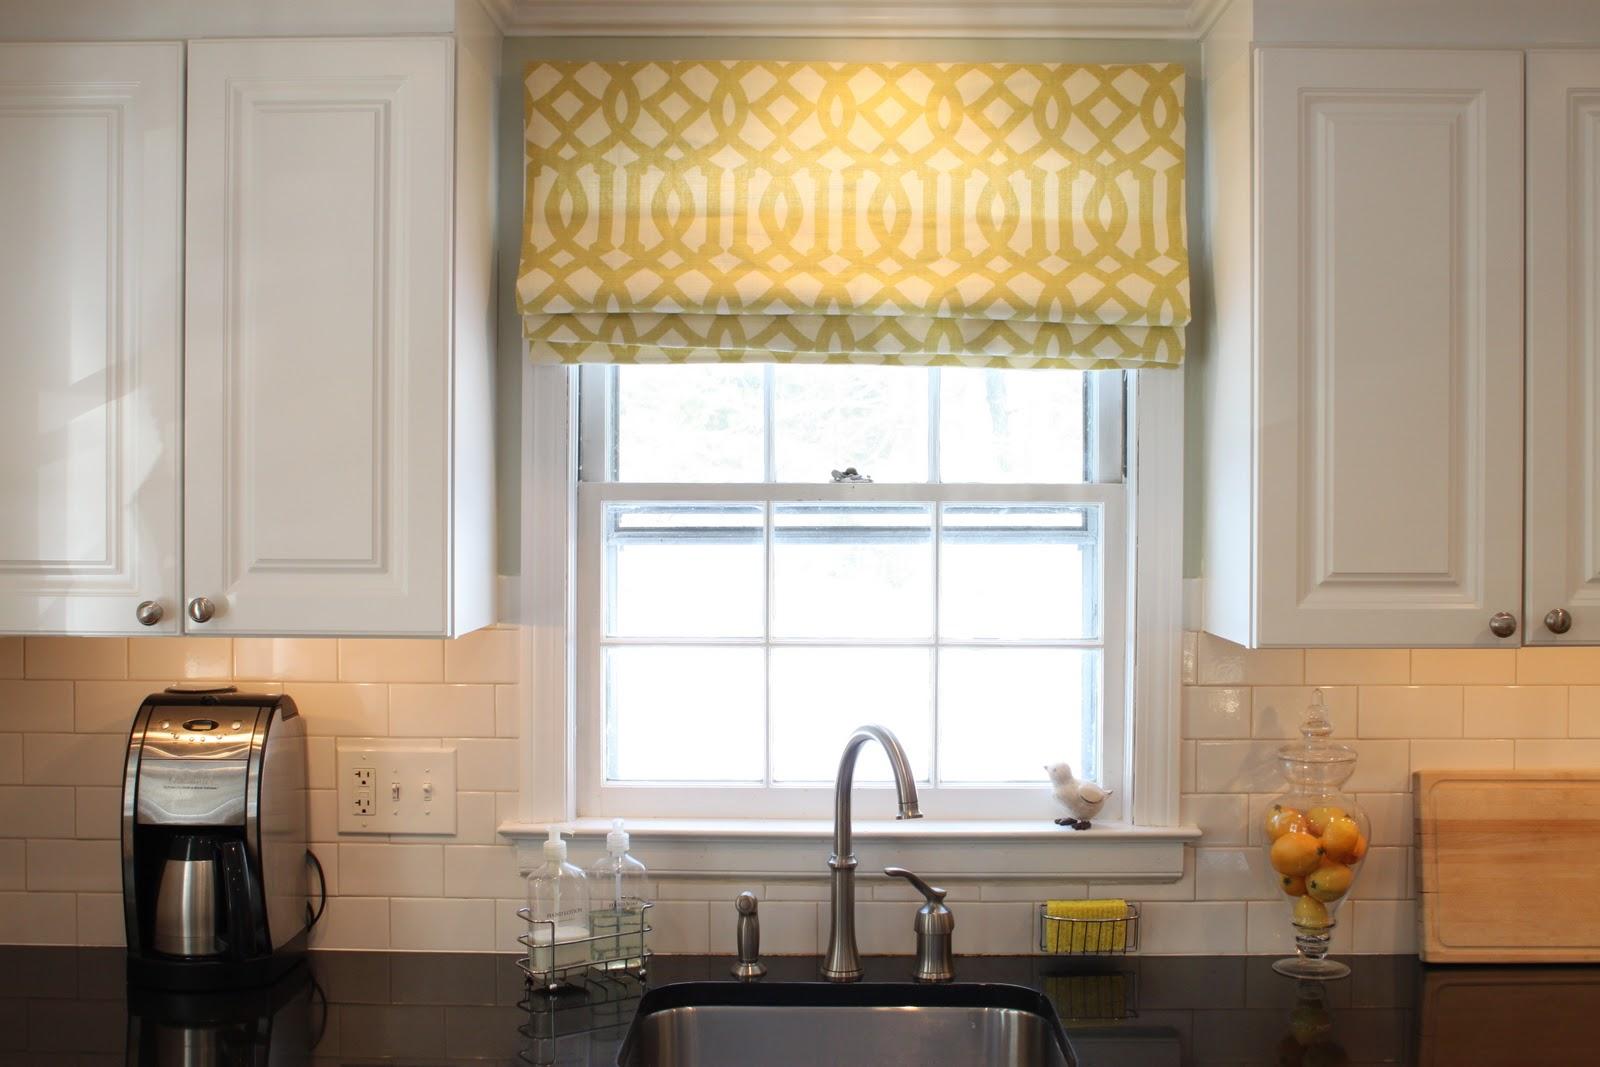 Kmart kitchen curtains | | Kitchen ideas